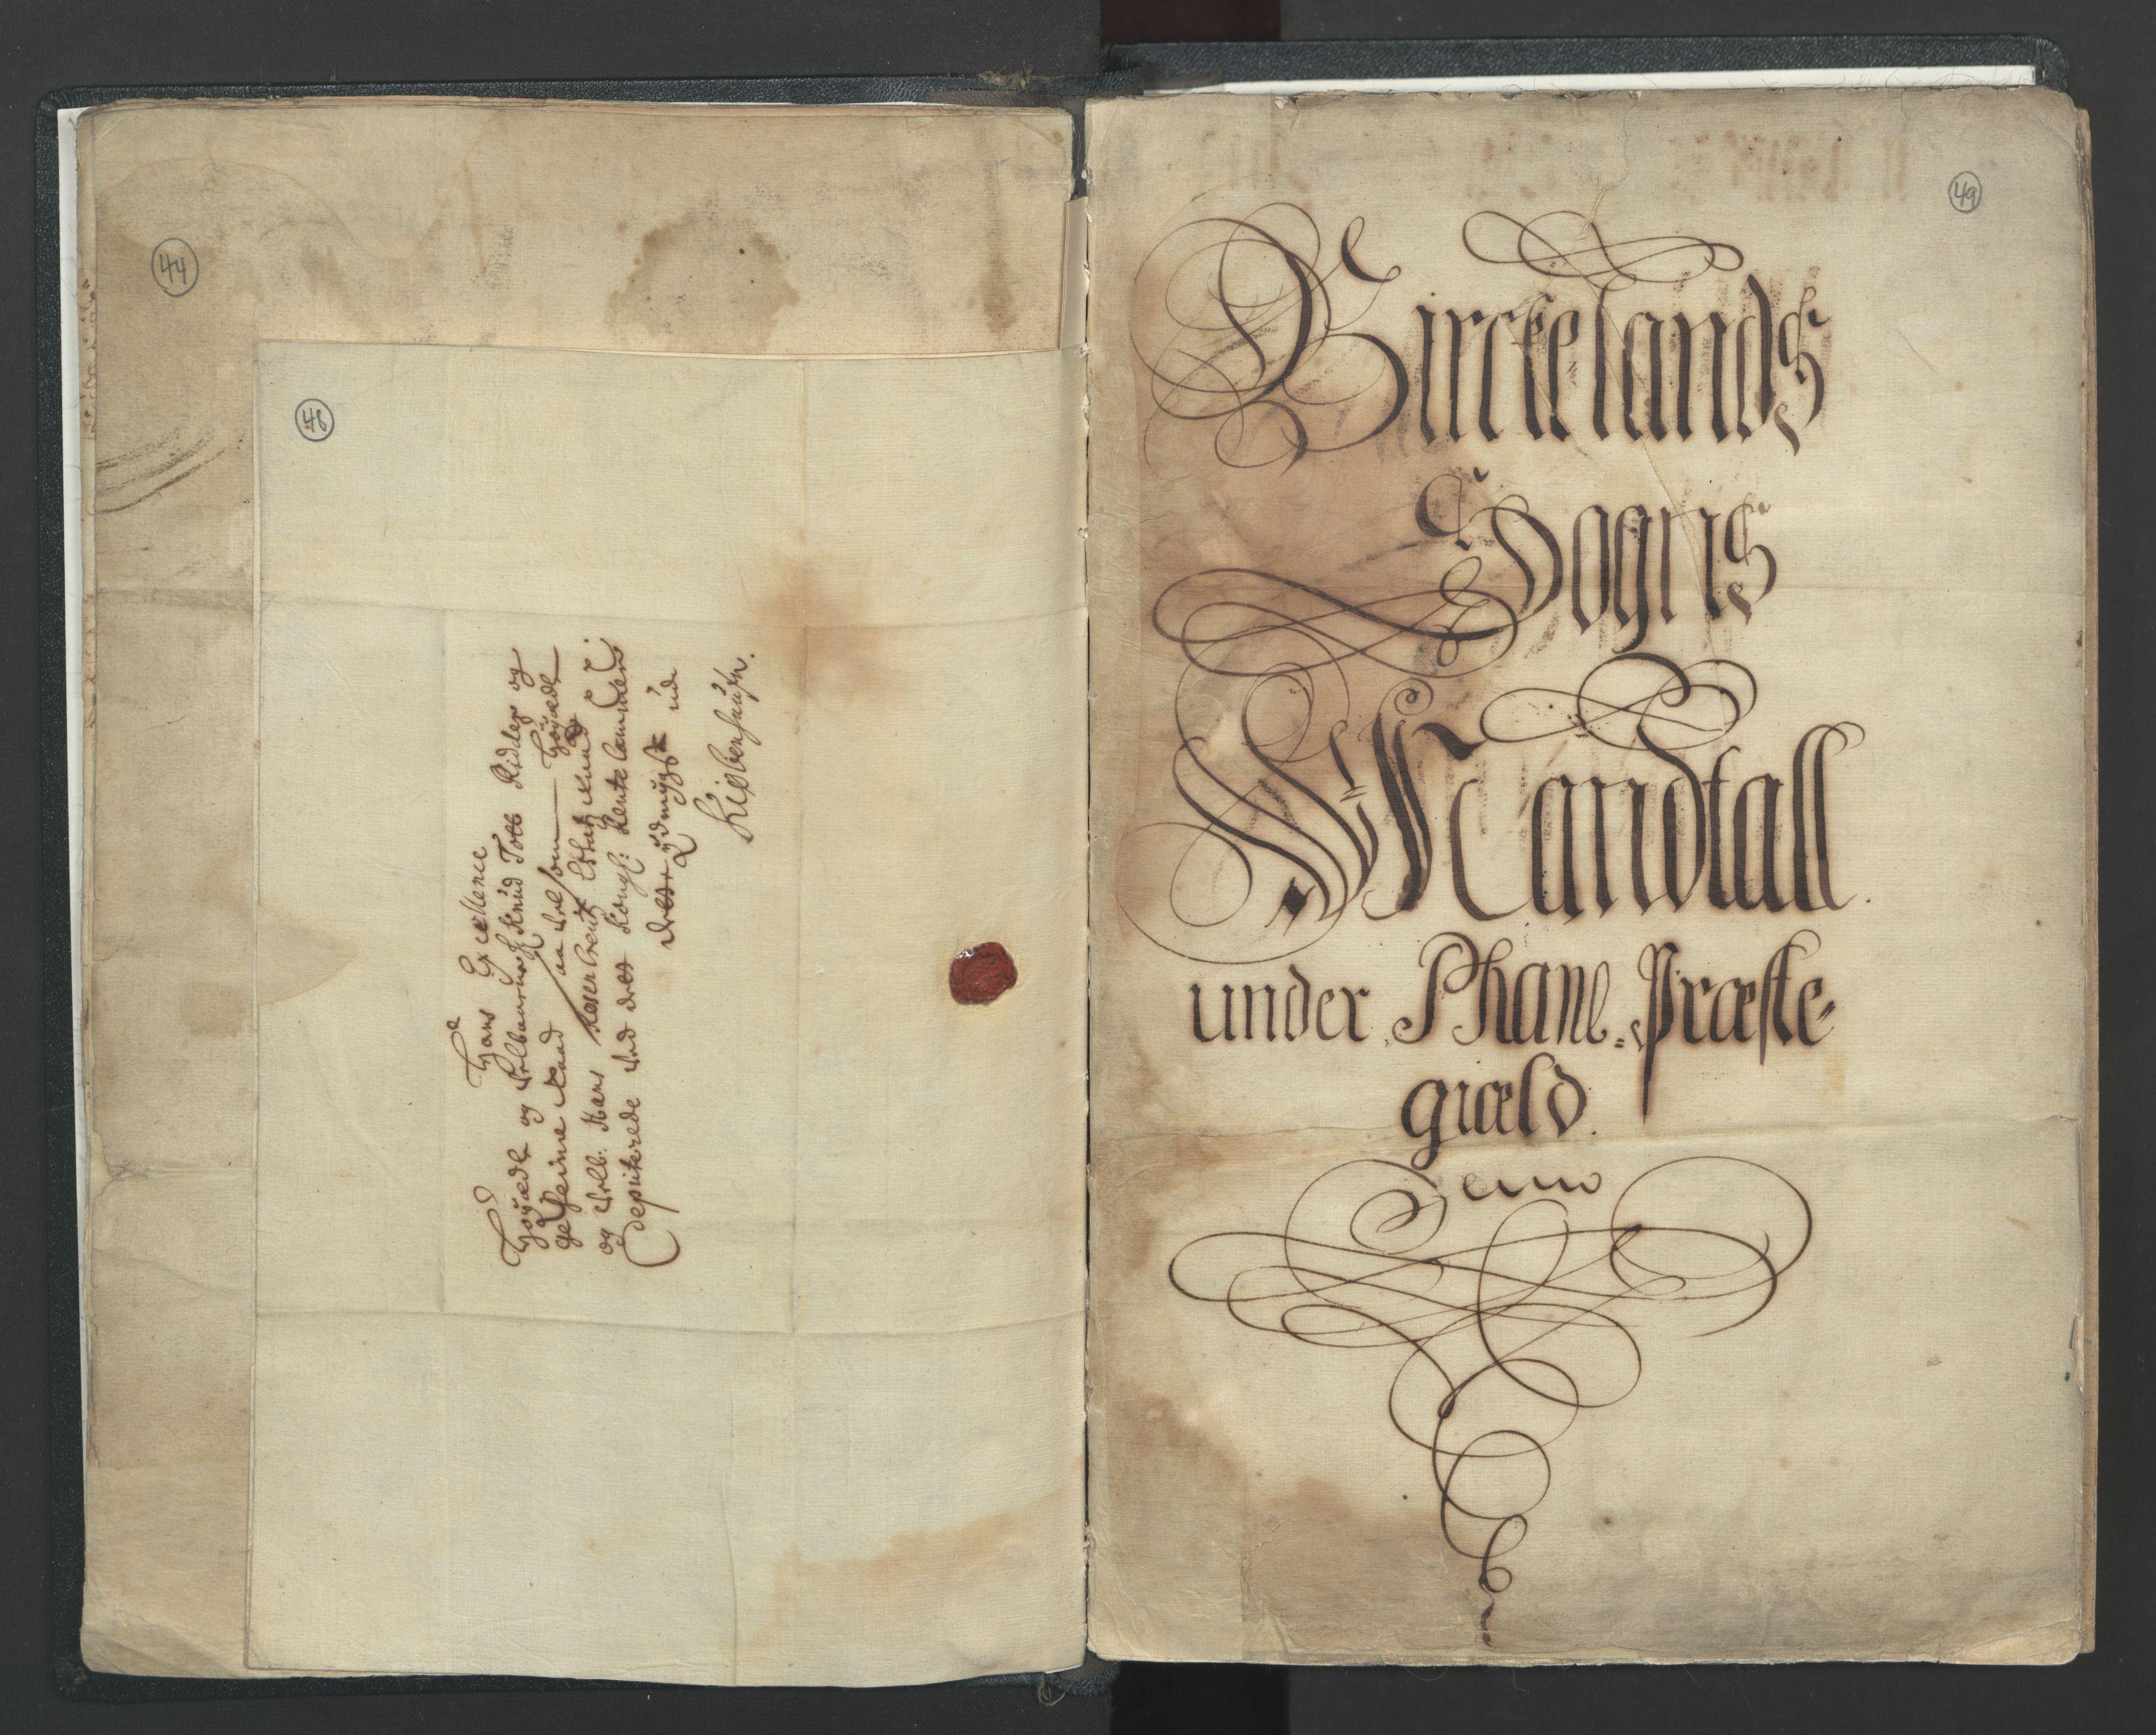 RA, Manntallet 1701, nr. 7: Nordhordland og Voss fogderi, 1701, s. 48-49